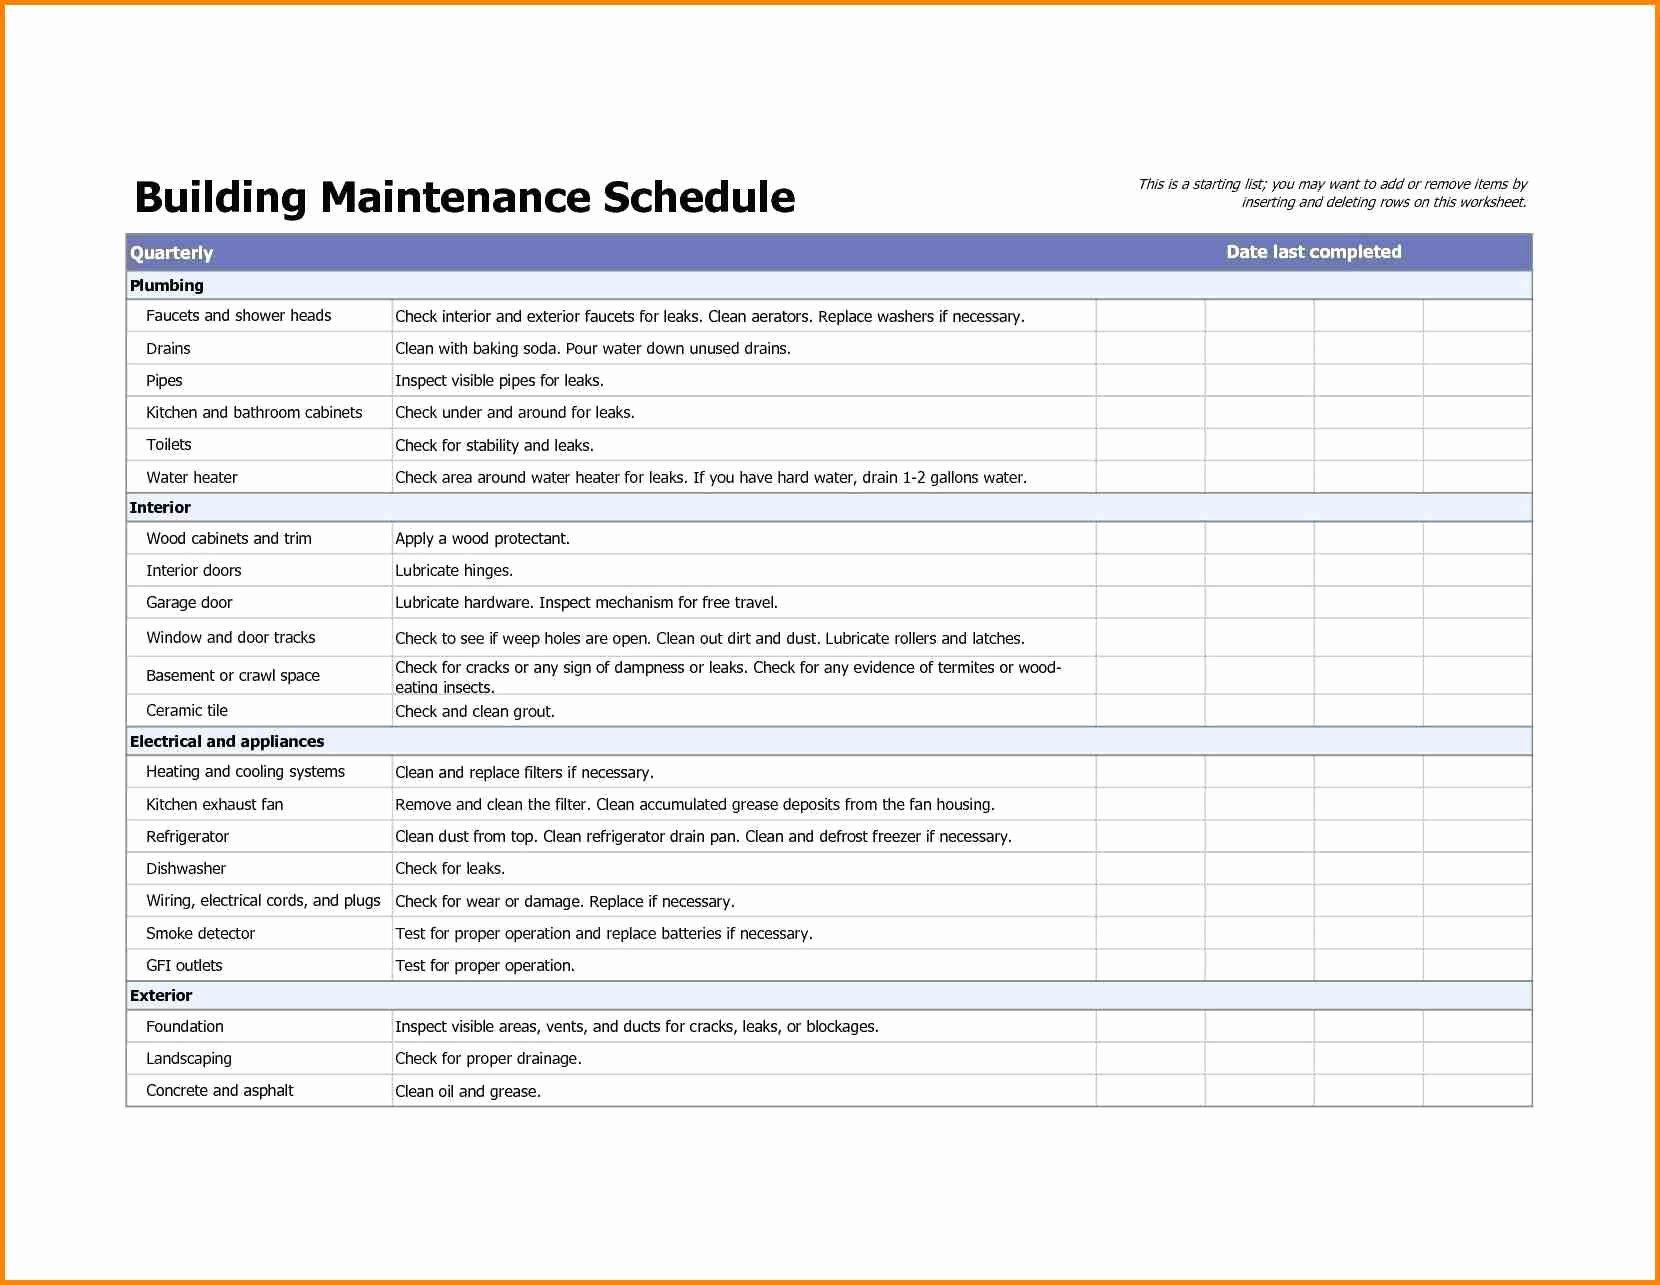 Preventive Maintenance Checklist Template Fresh Building Maintenance Checklists – Emmamcintyrephotography